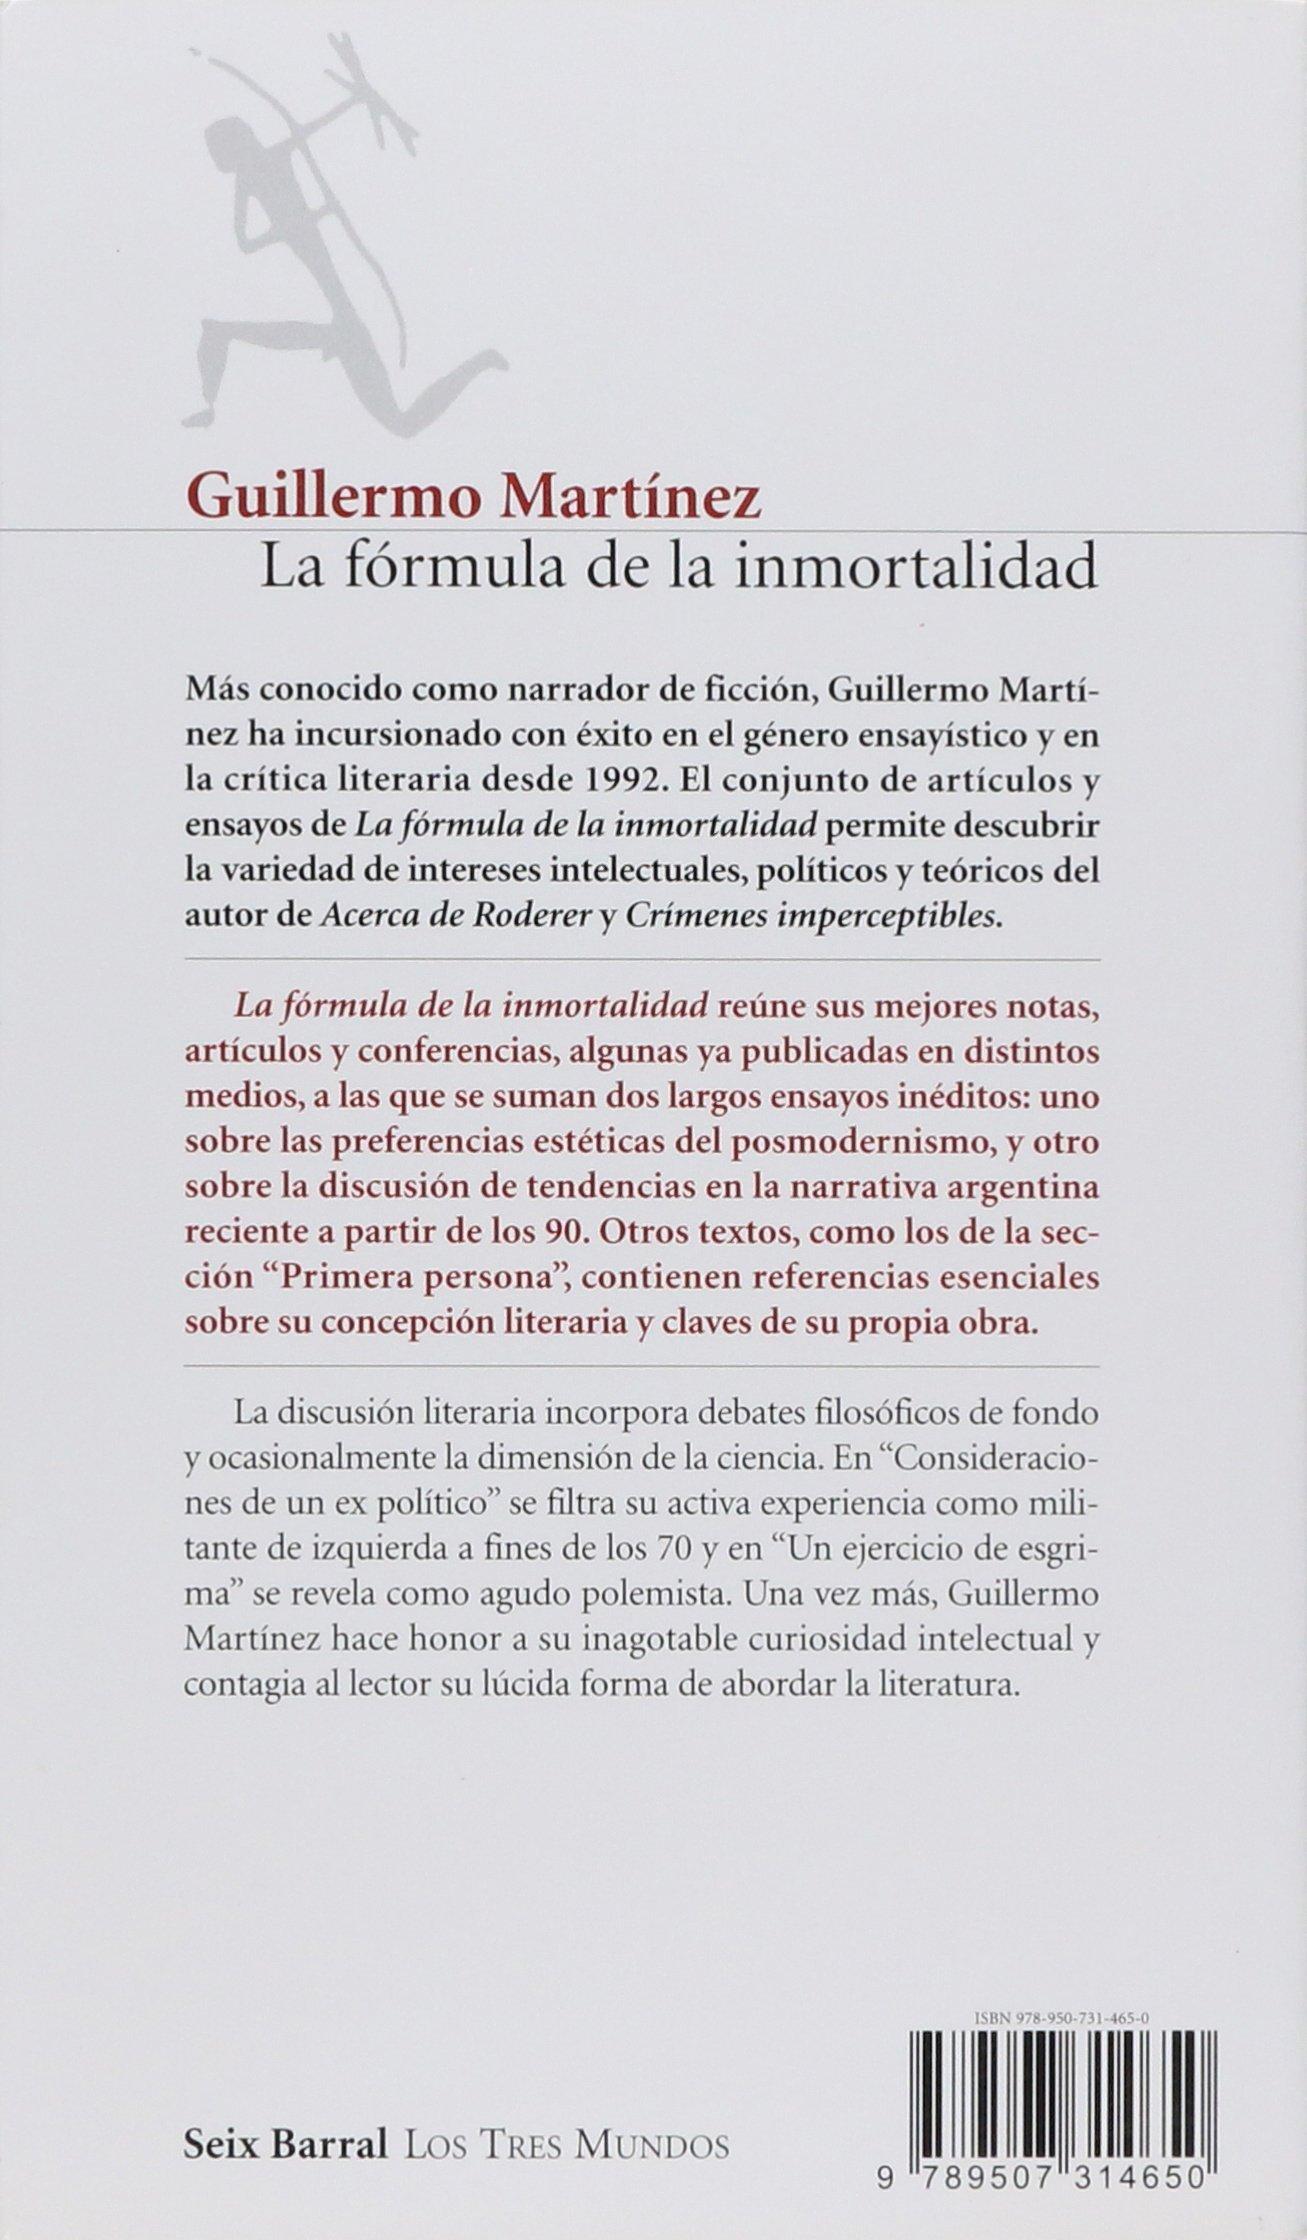 La Formula De La Inmortalidad (spanish Edition): Guillermo Martinez:  9789507314650: Amazon: Books